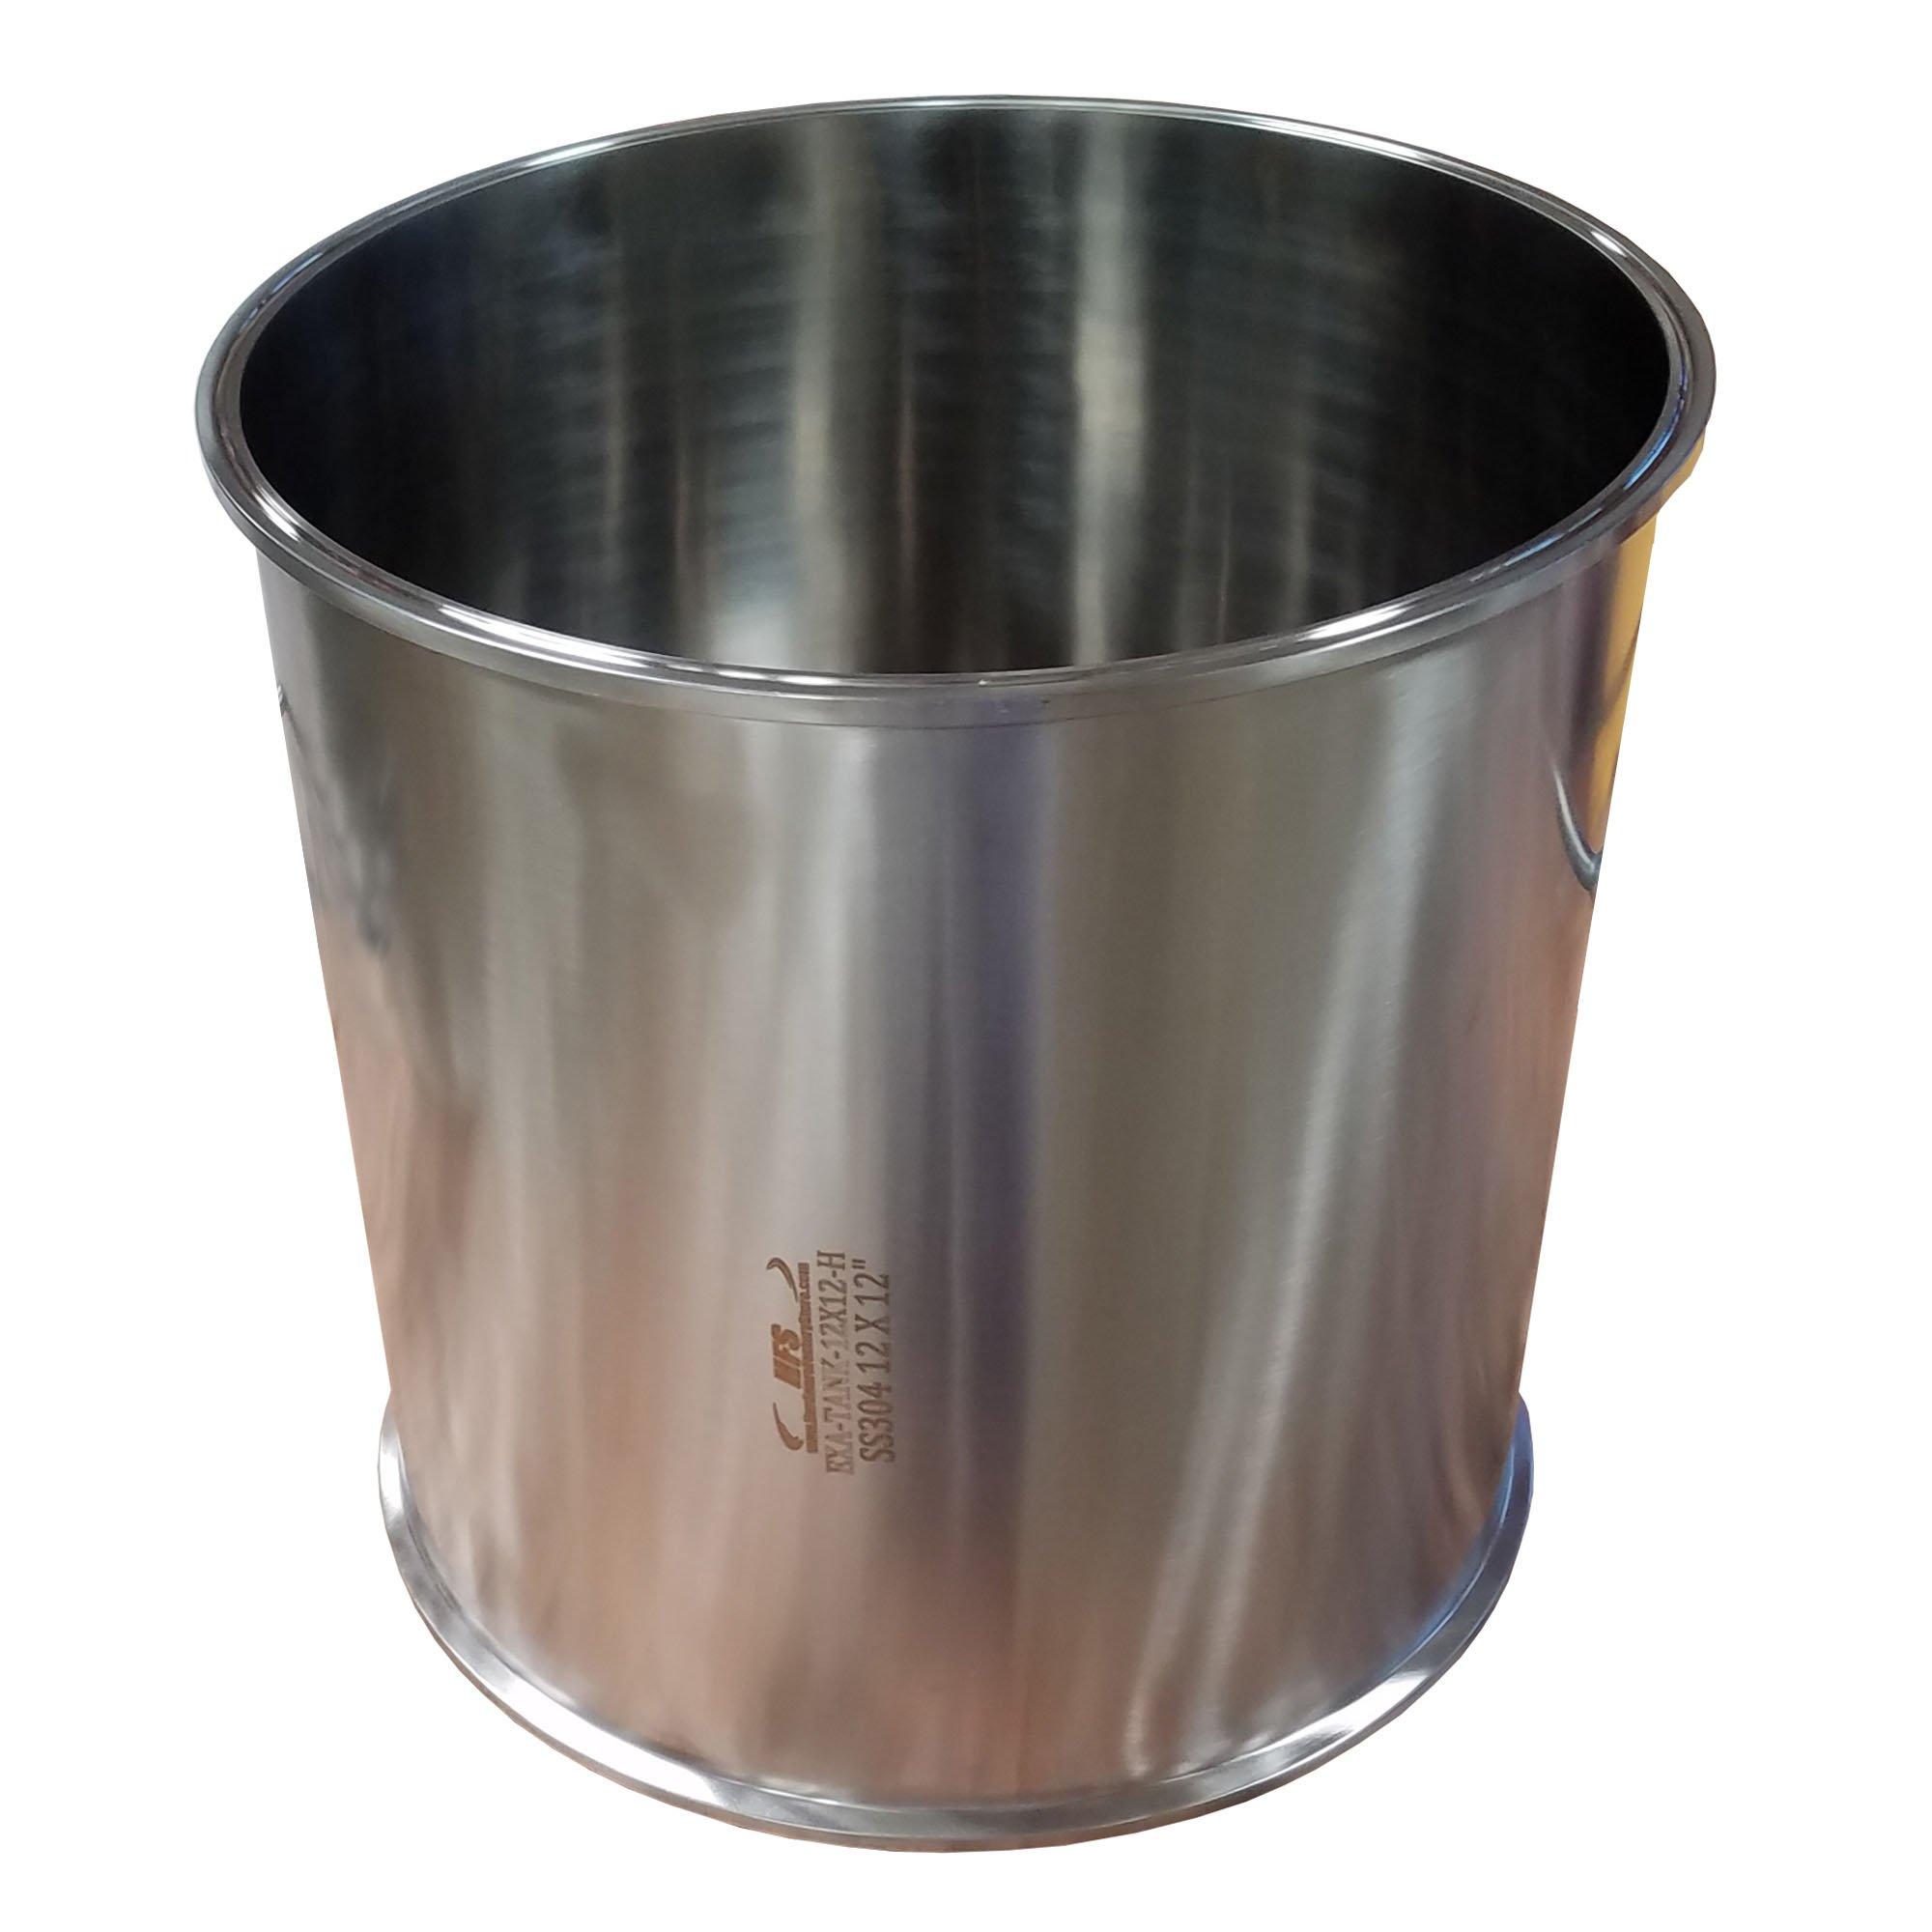 HFS (R) 6x12 Dia 6'' Length 12'' Sanitary Spool - Tri Clamp Clover Stainless Steel 304